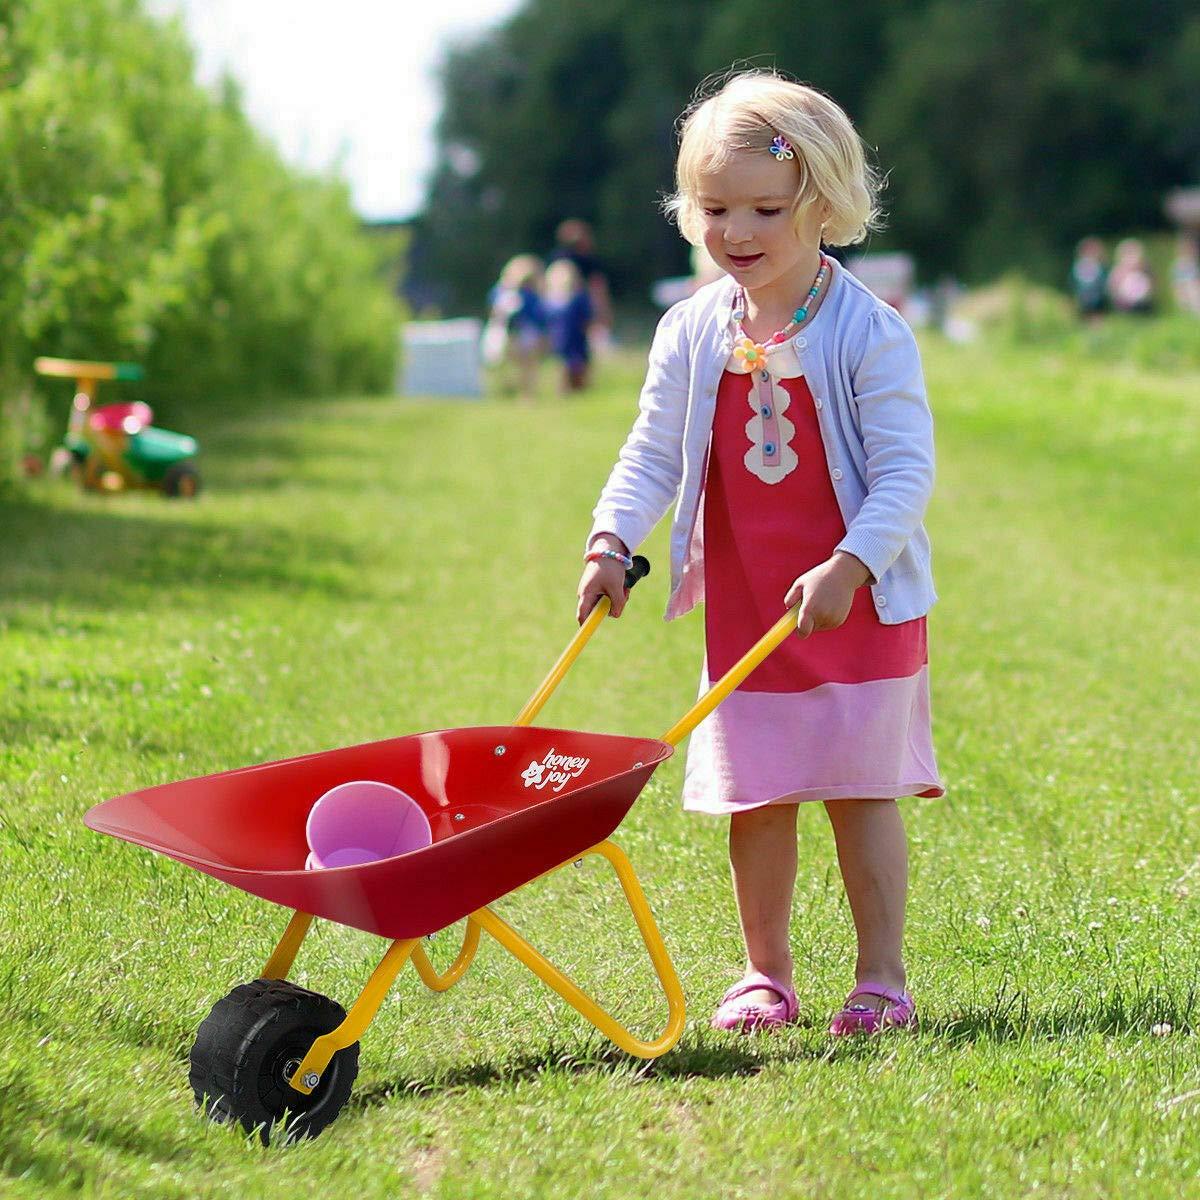 Heize best price Red Kids Metal Wheelbarrow Children's Size Outdoor Garden Backyard Play Toy by Heize best price (Image #2)